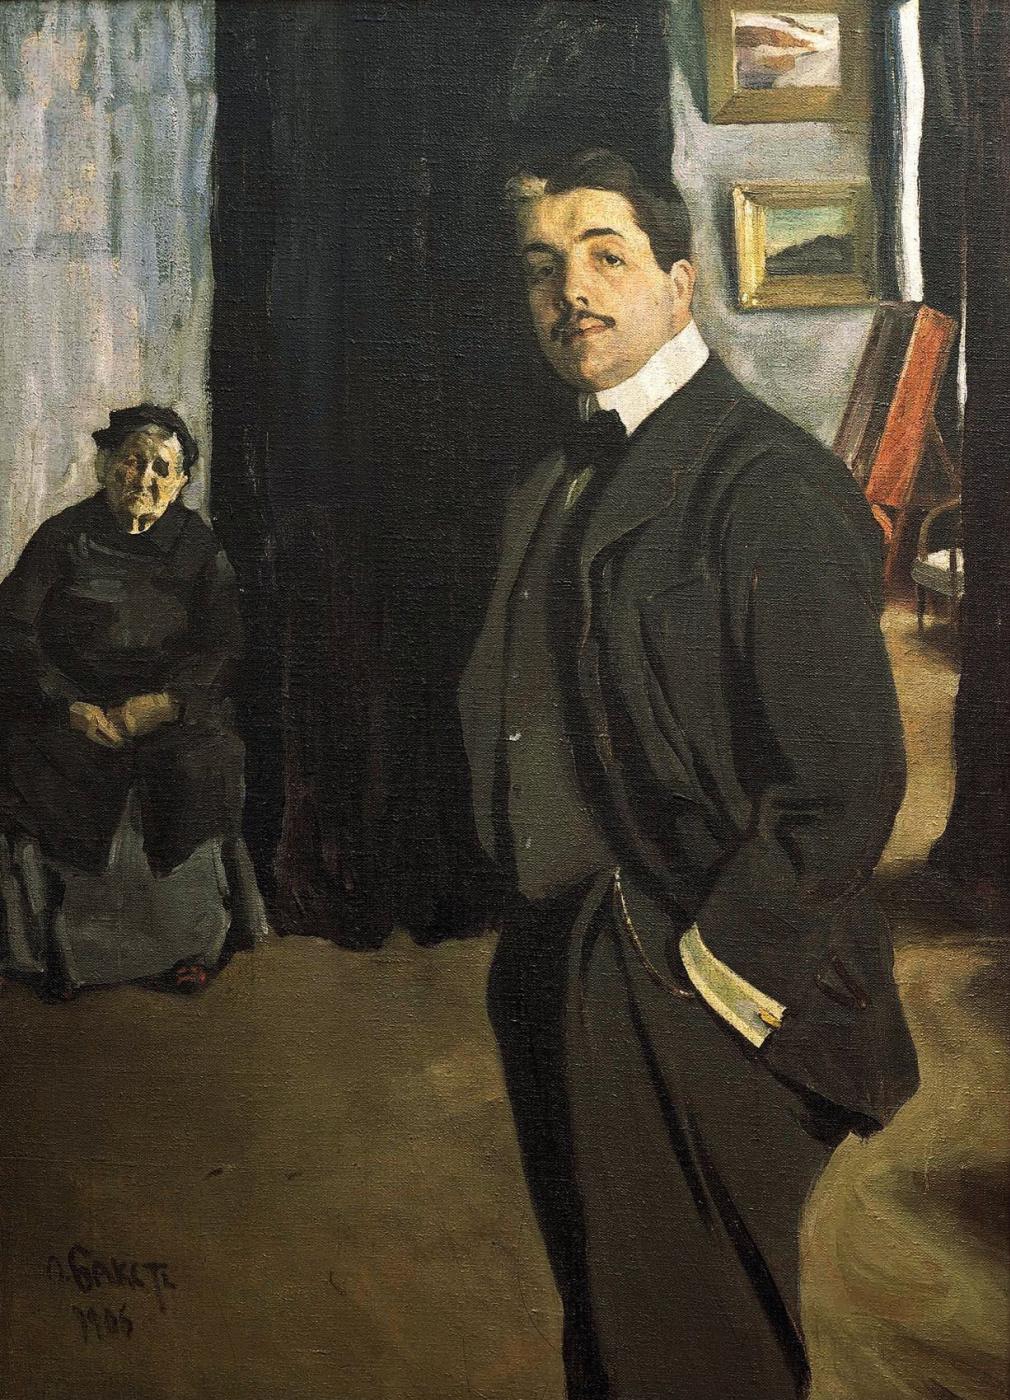 Lev (Leon) Bakst. Portrait of Sergei Pavlovich Diaghilev with his nanny